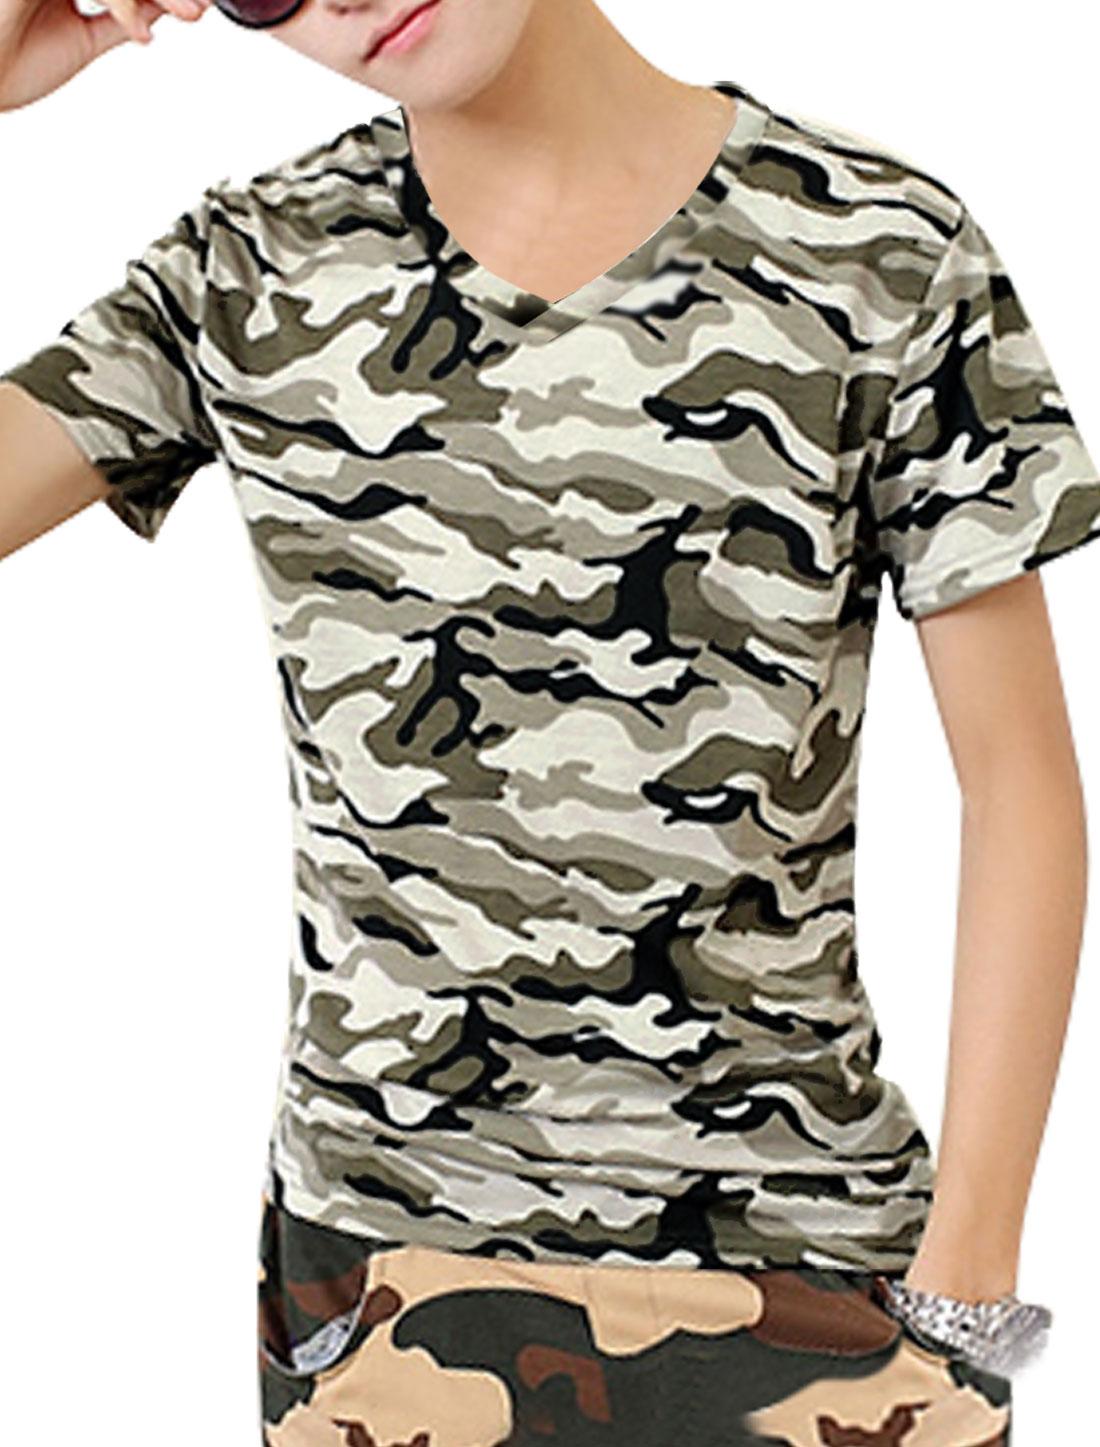 Men Slipover V Neck Camouflage Pattern Trendy Tee Khaki Army Green S